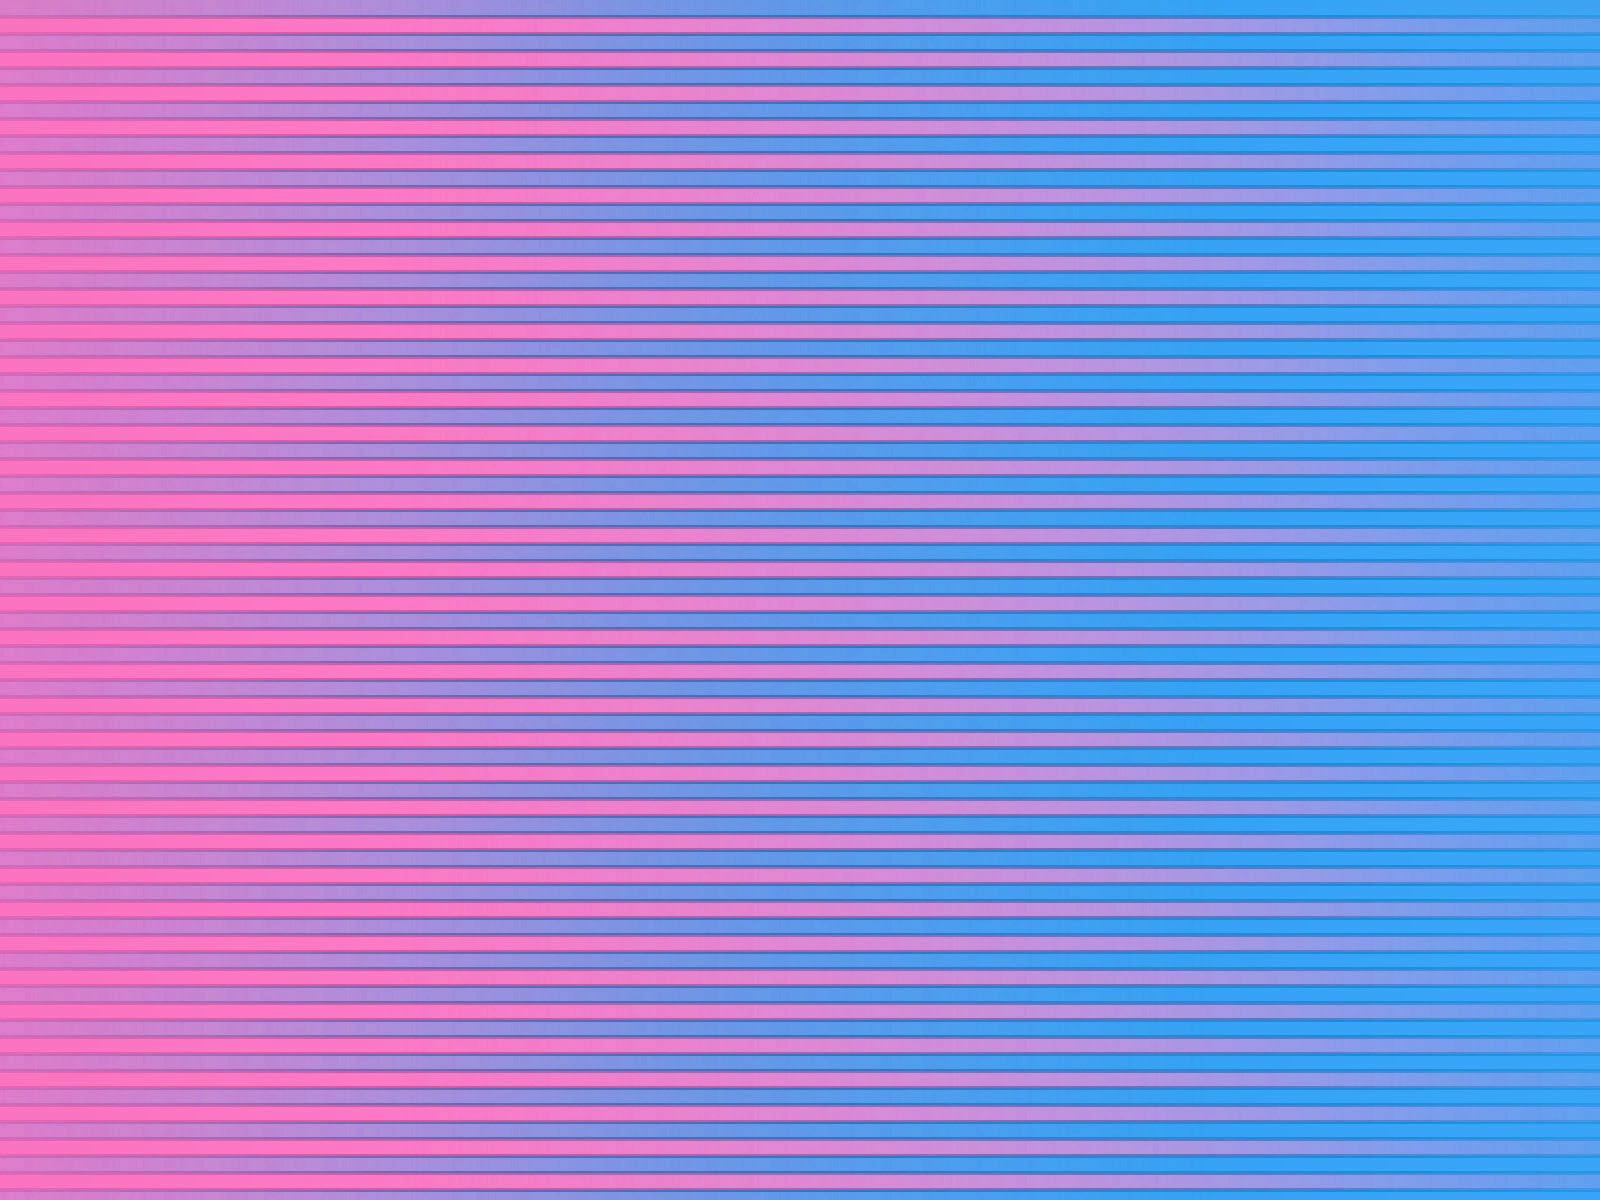 Pink And Blue Striped Wallpaper 2989 Wallpaper: Sh Yn Design: Stripe Pattern Wallpaper : Turquoise Pink